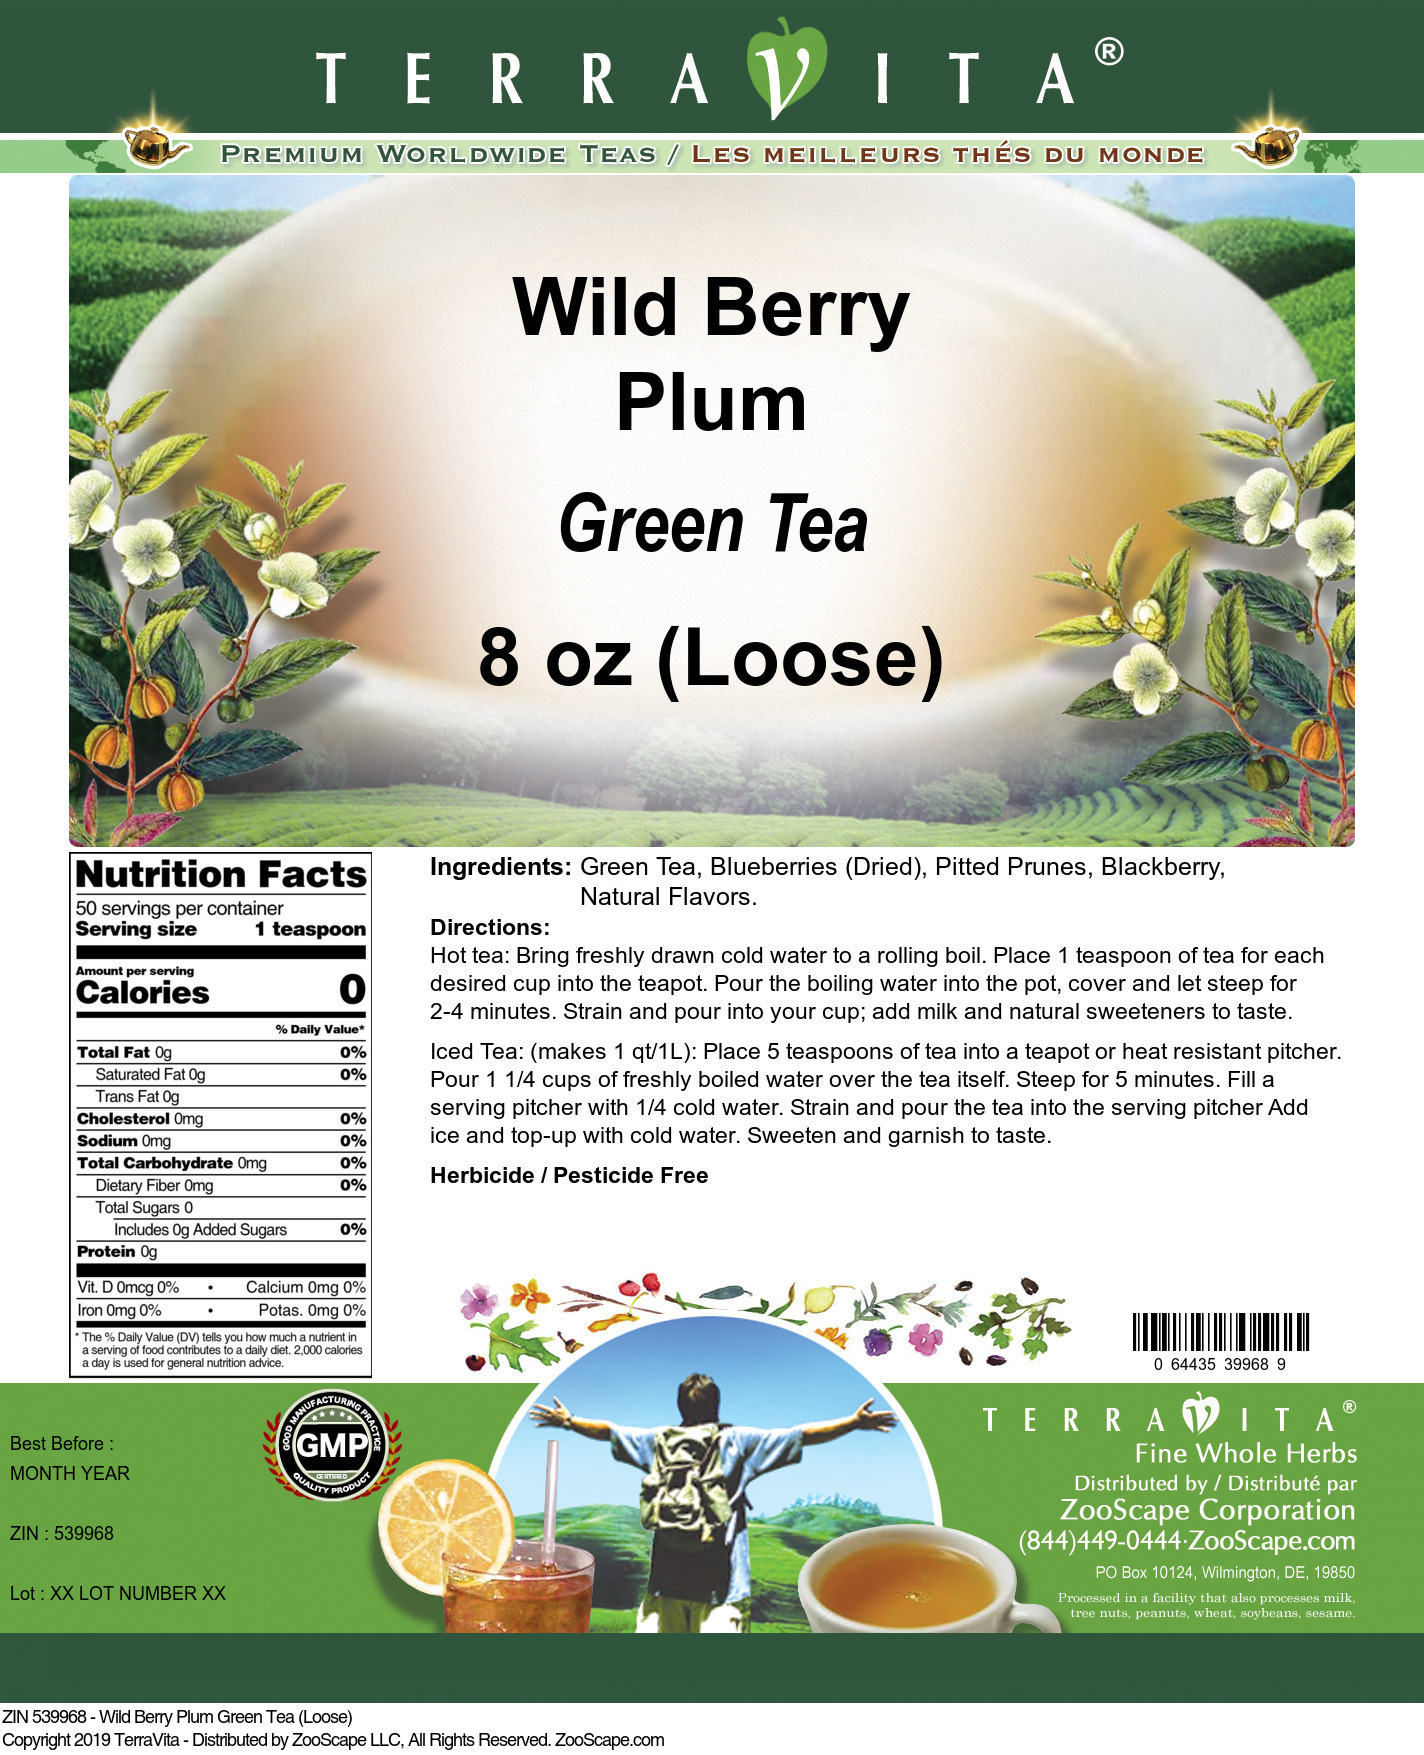 Wild Berry Plum Green Tea (Loose)